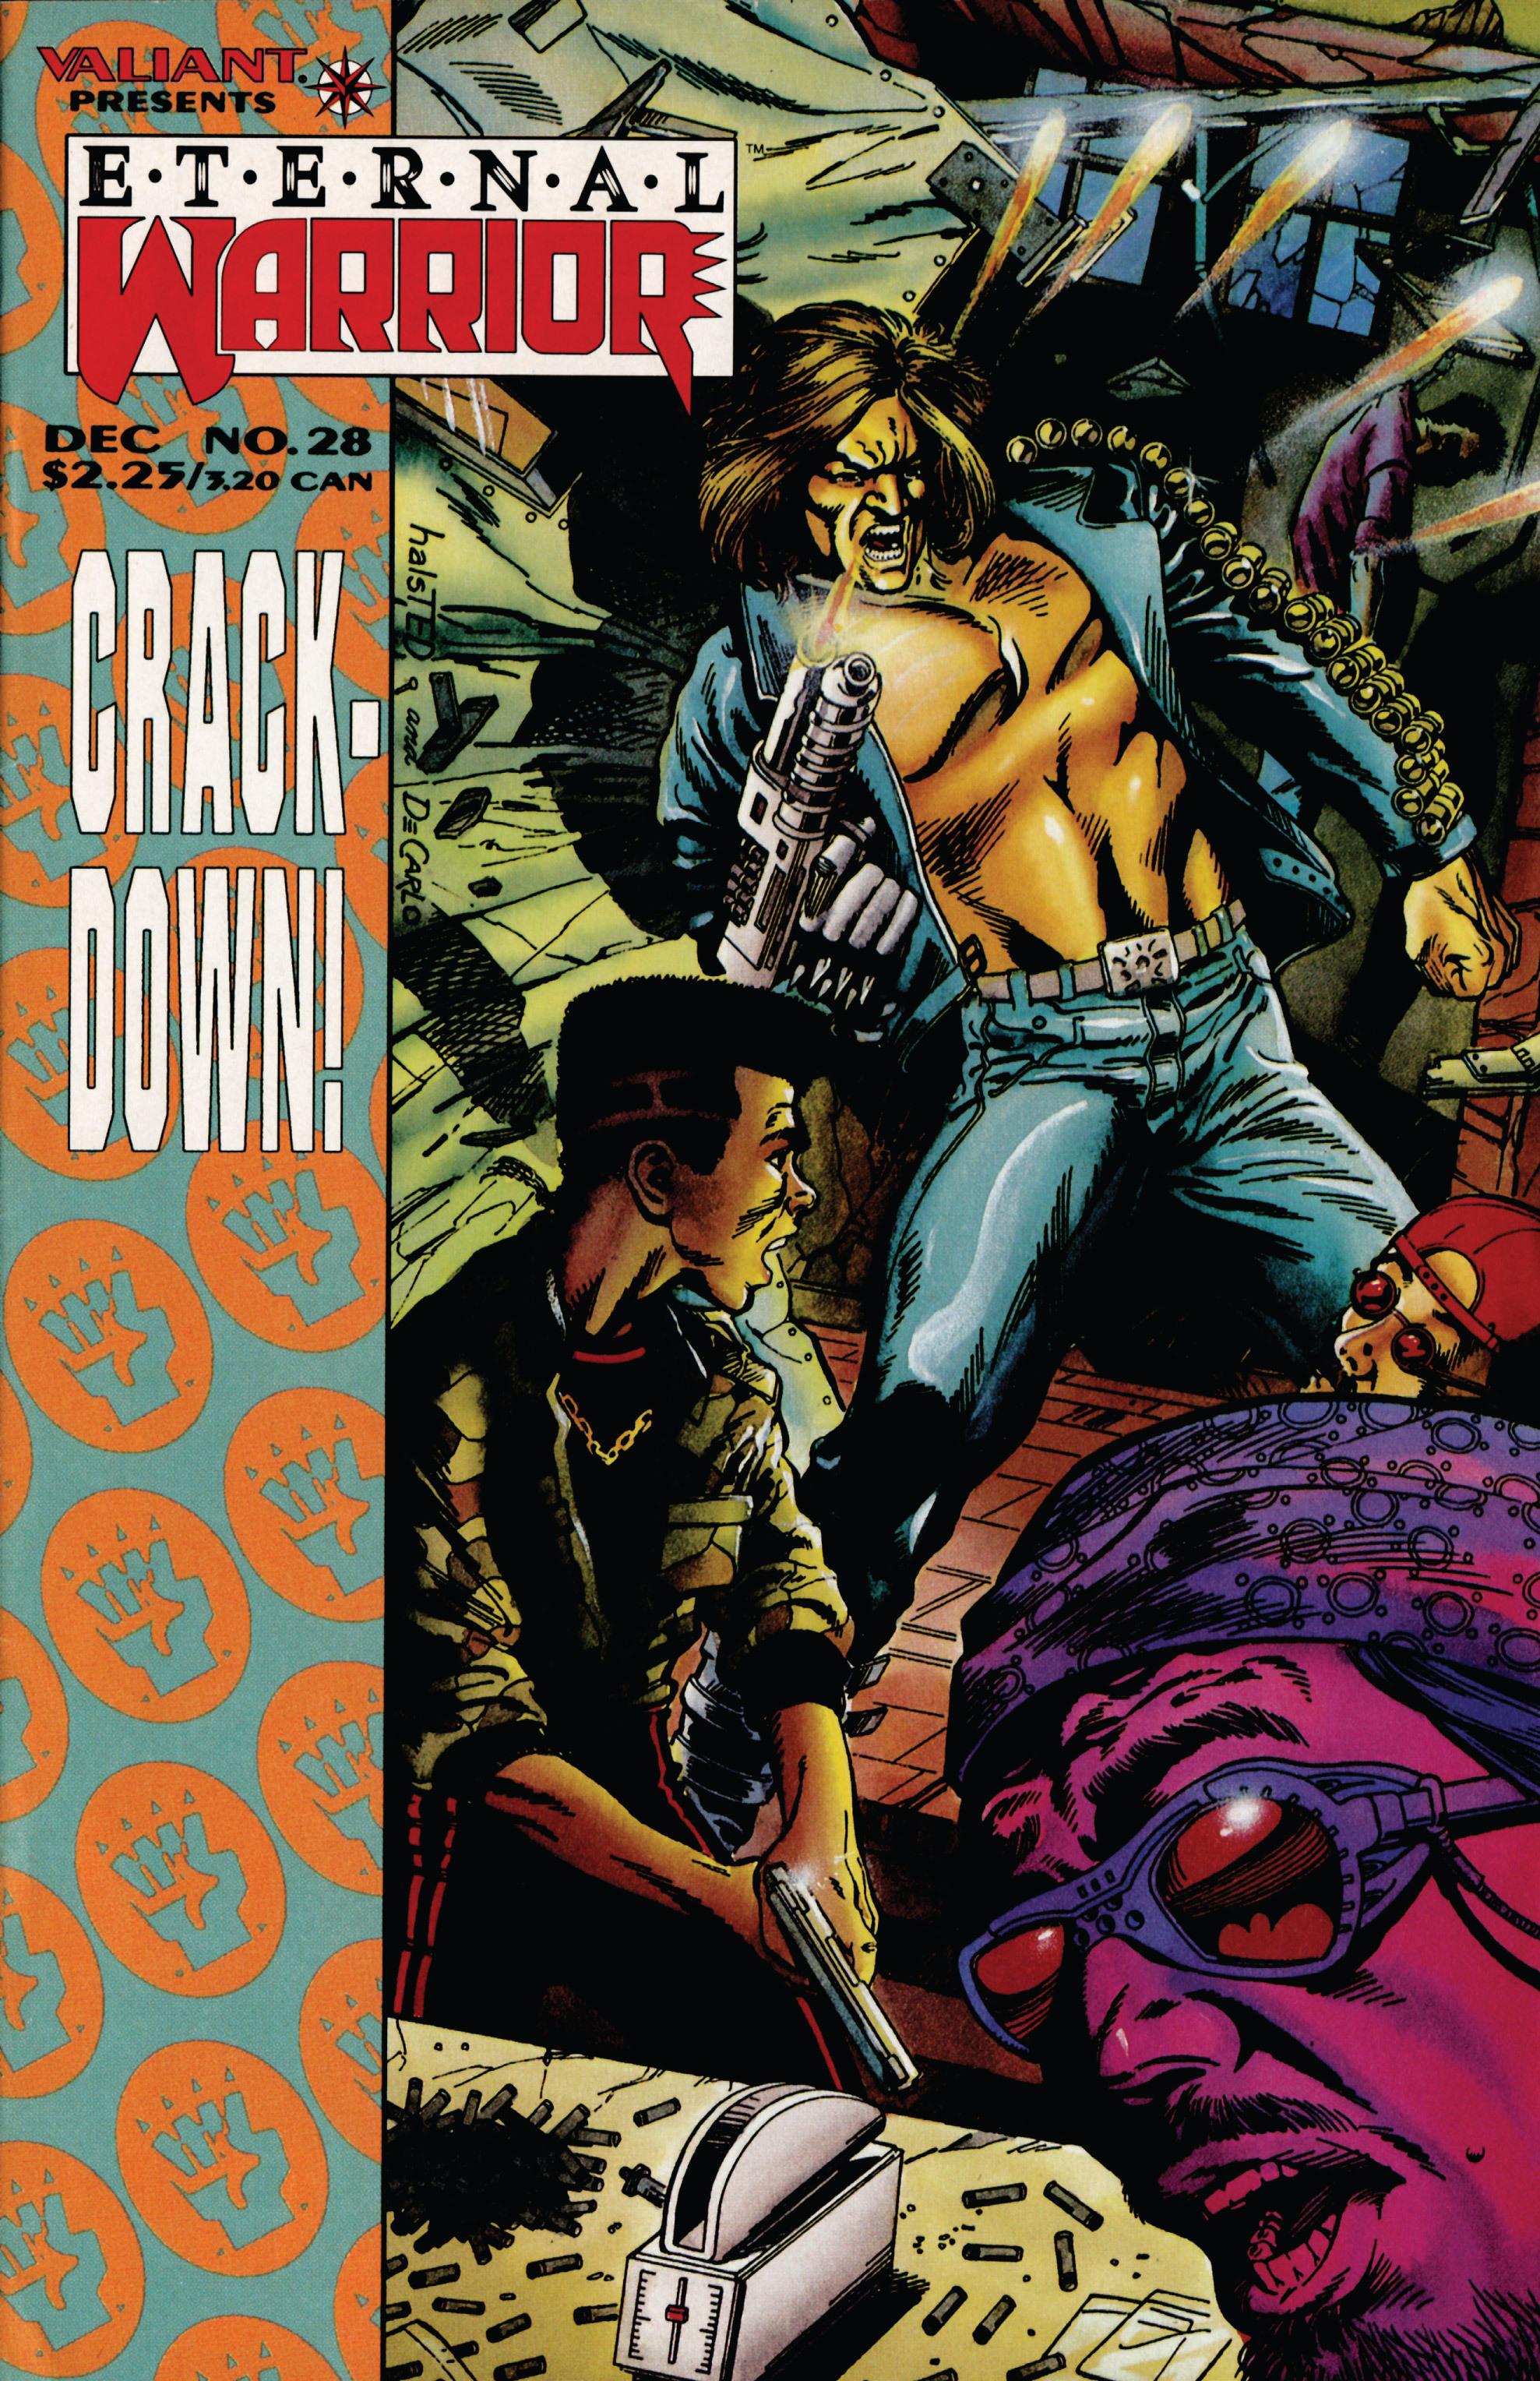 Read online Eternal Warrior (1992) comic -  Issue #28 - 1